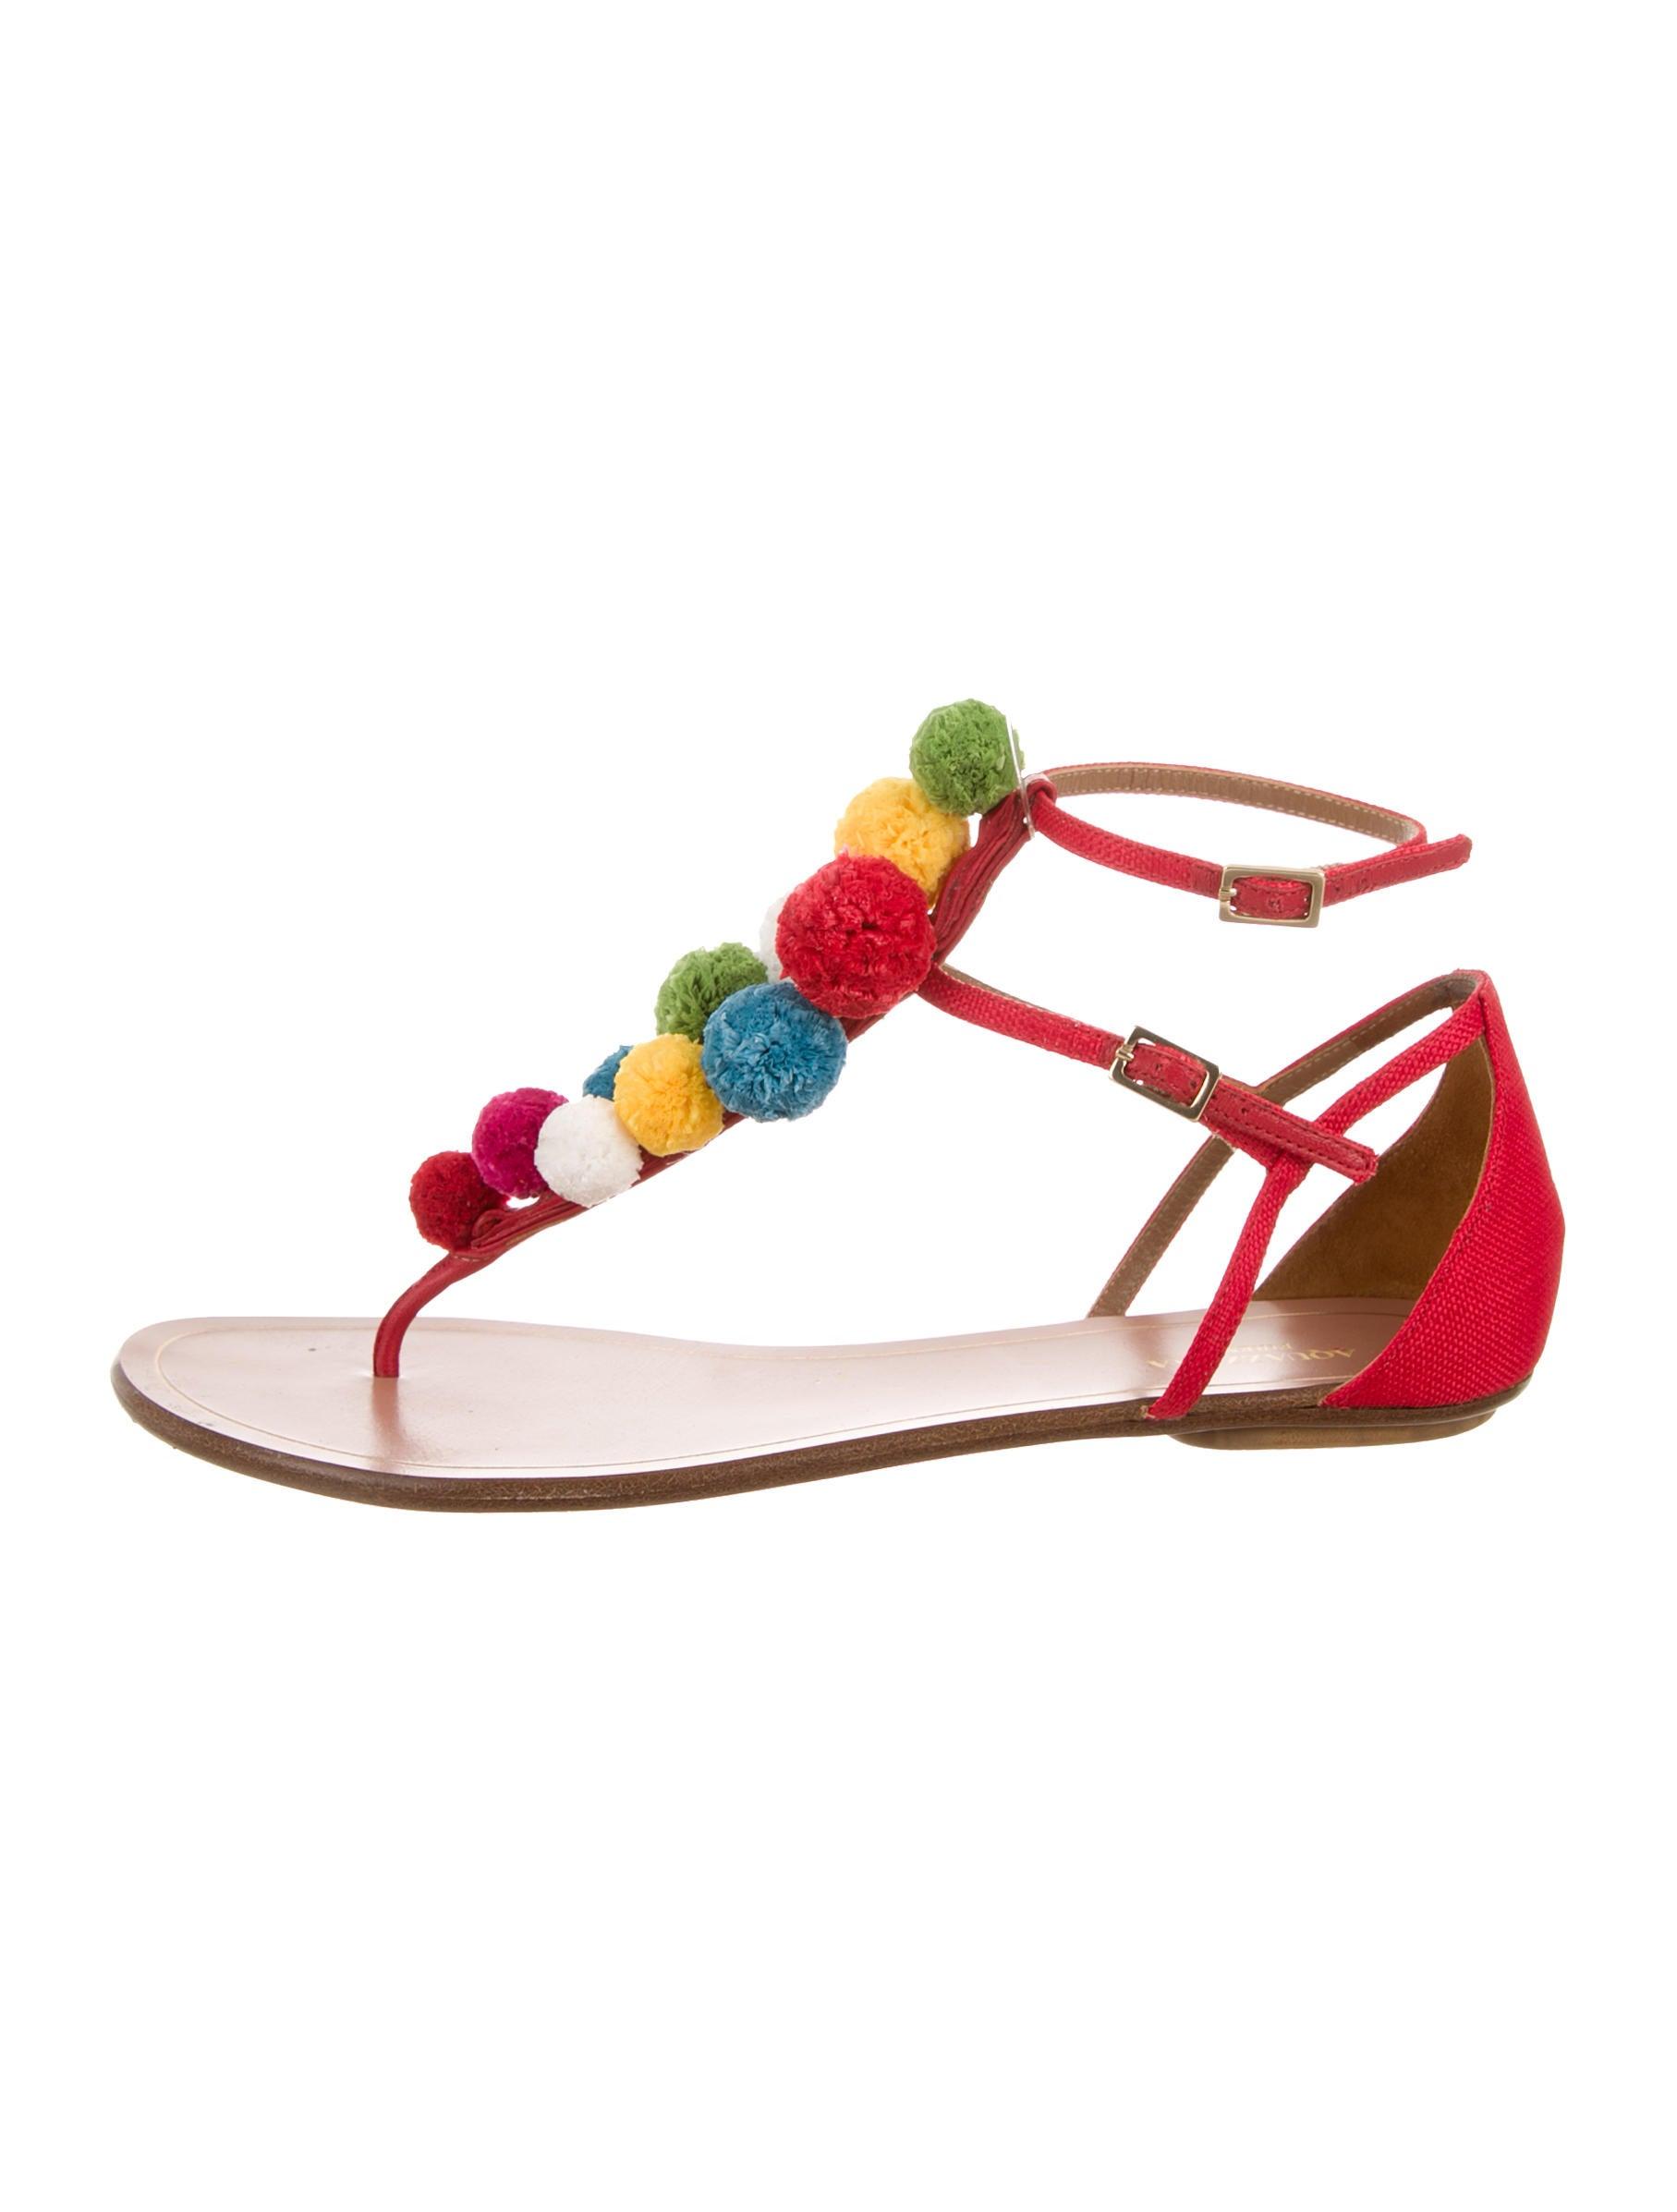 Aquazzura Pom-Pom Ankle Strap Sandals - Shoes